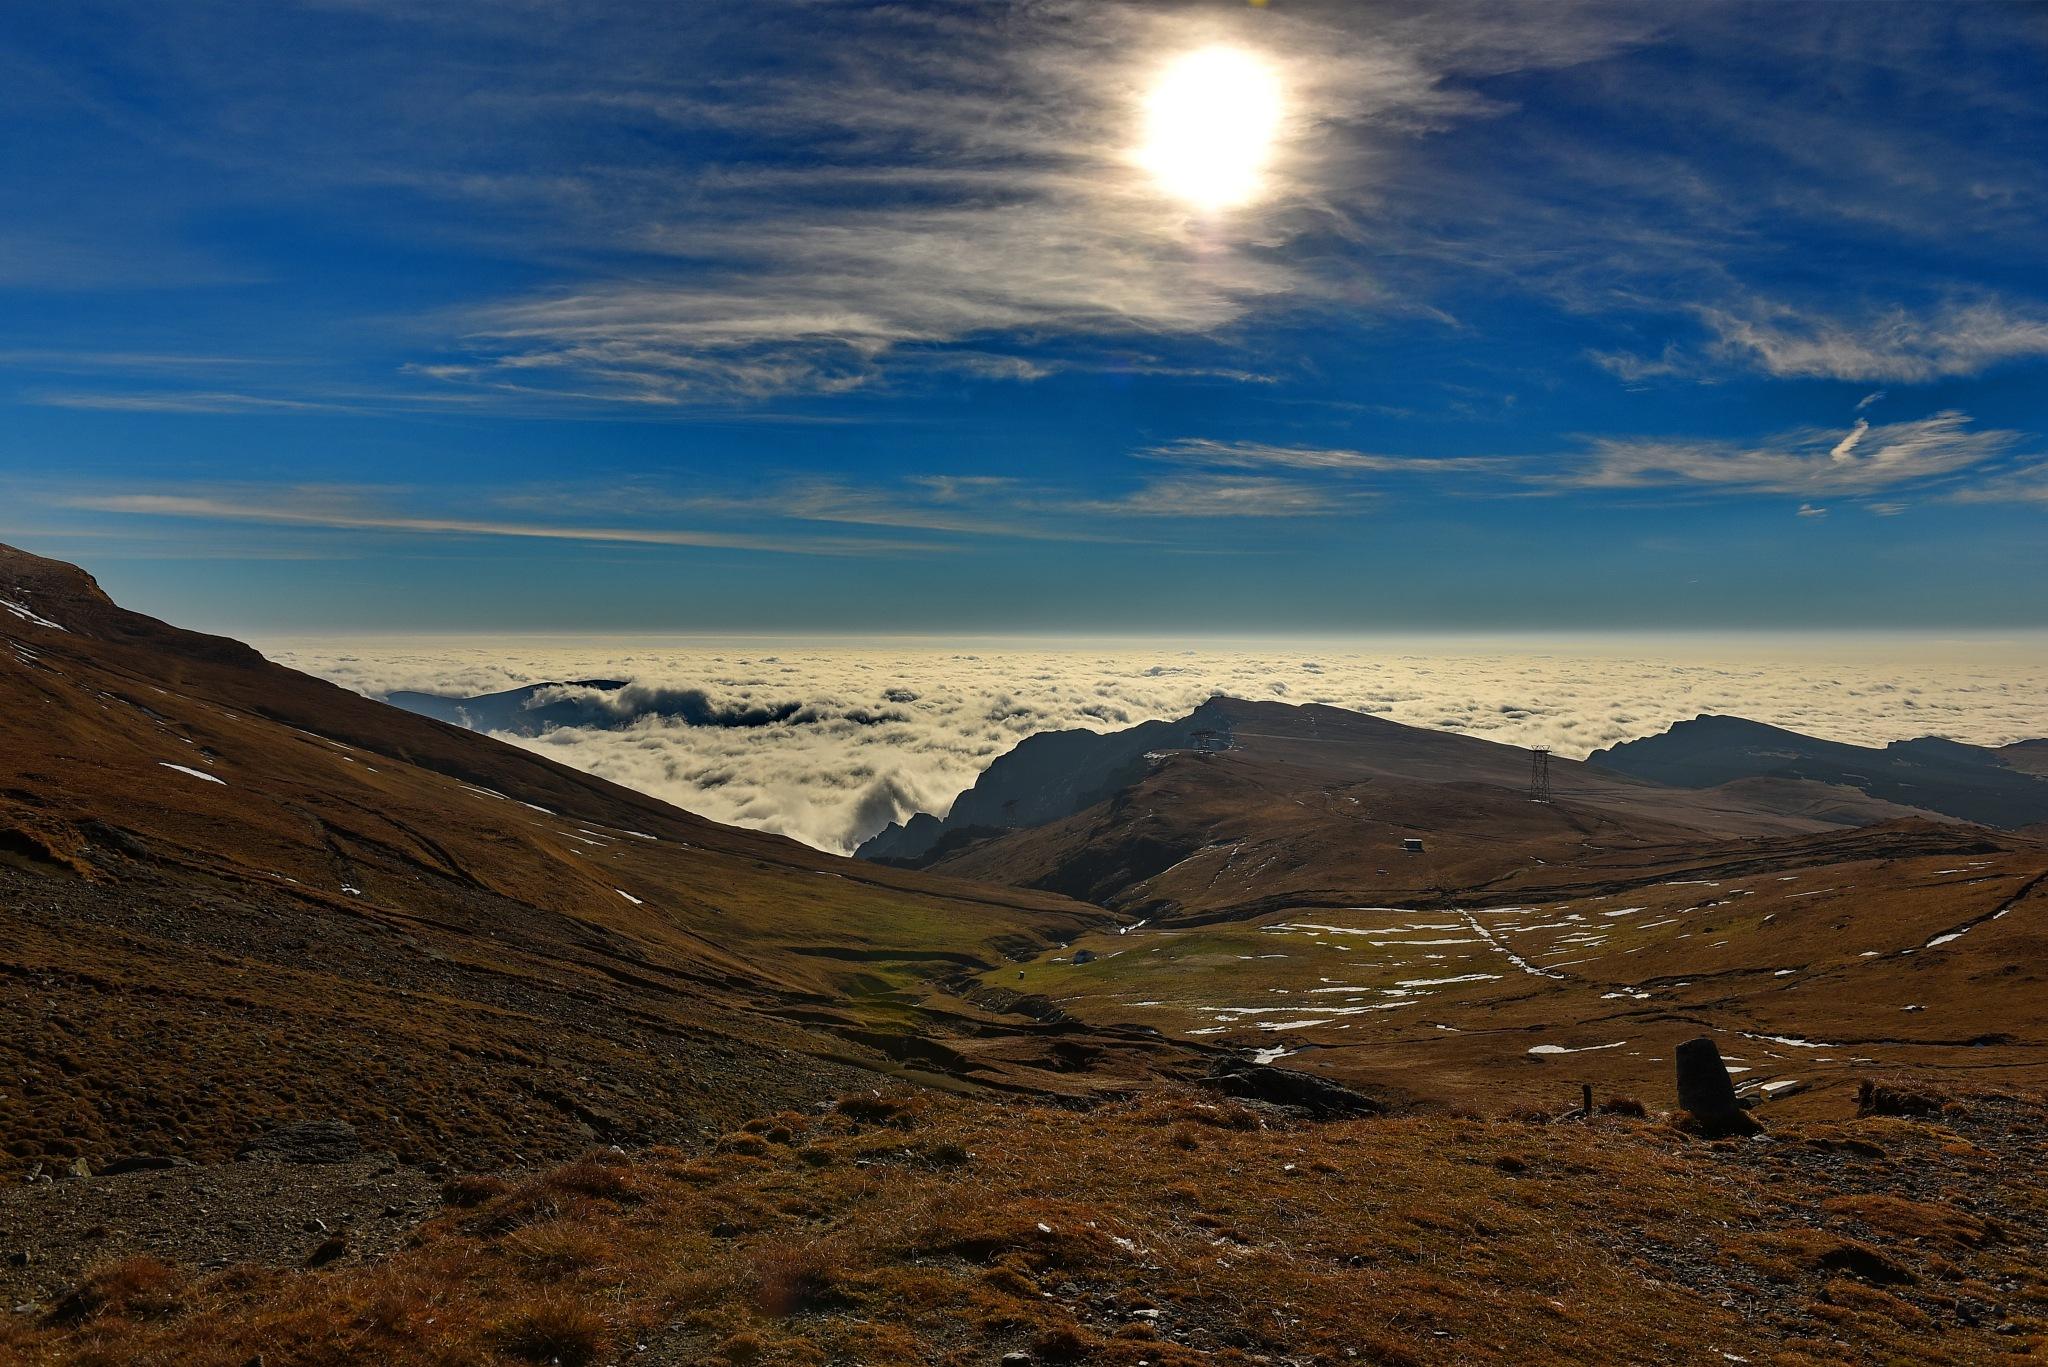 Sunrise, Bucegi Mountains, alt. 2292m by Sorin Lazar Photography